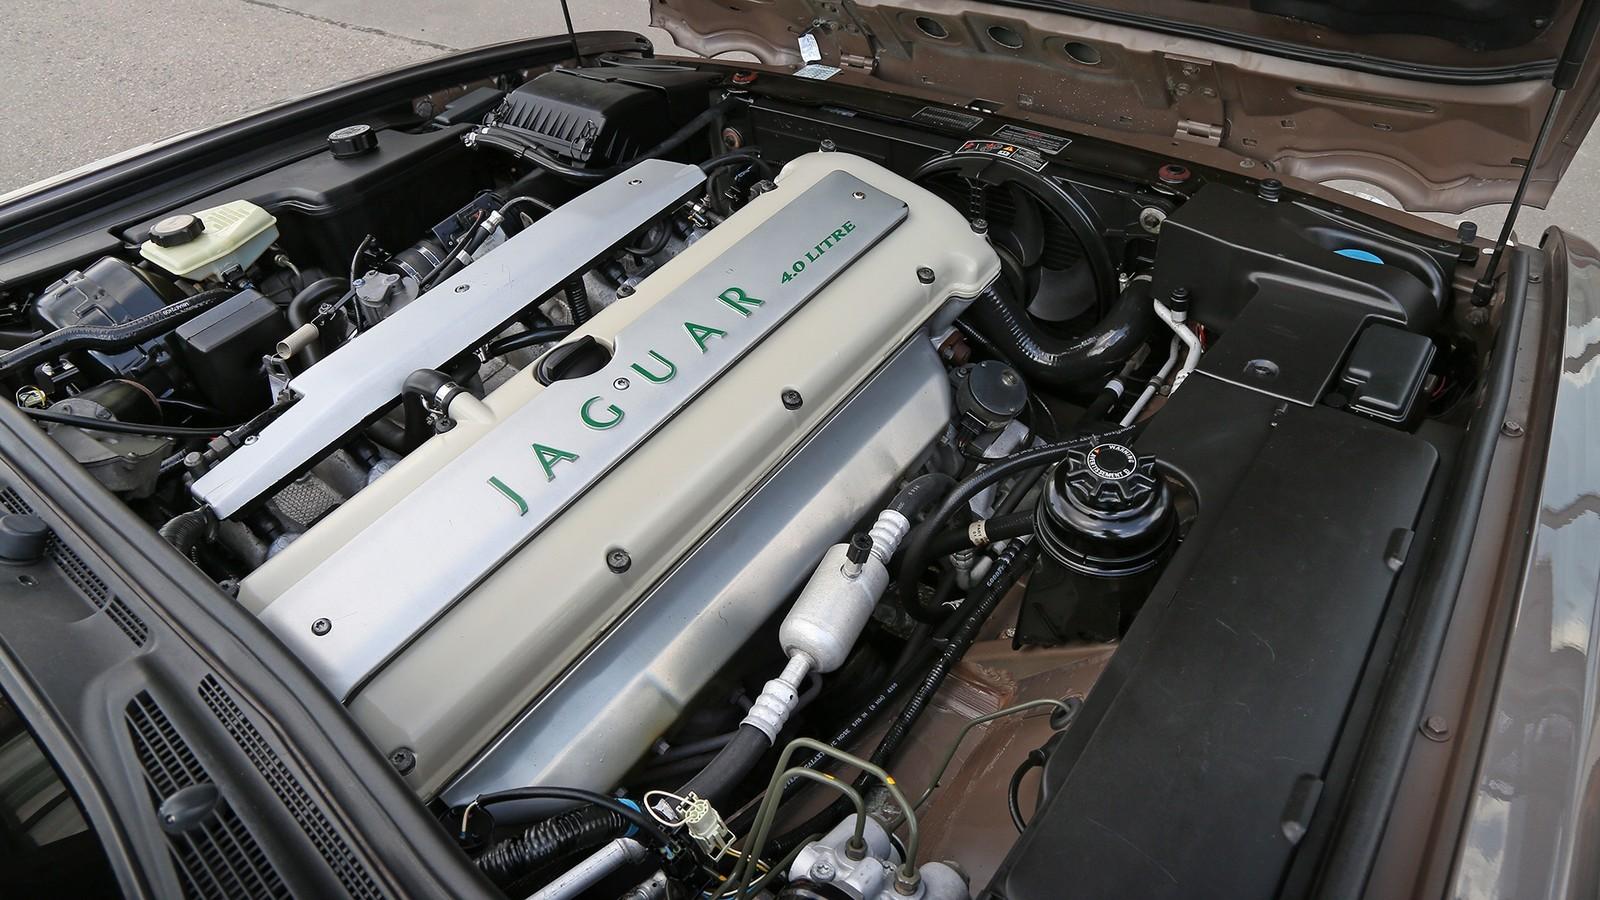 KC2A6854